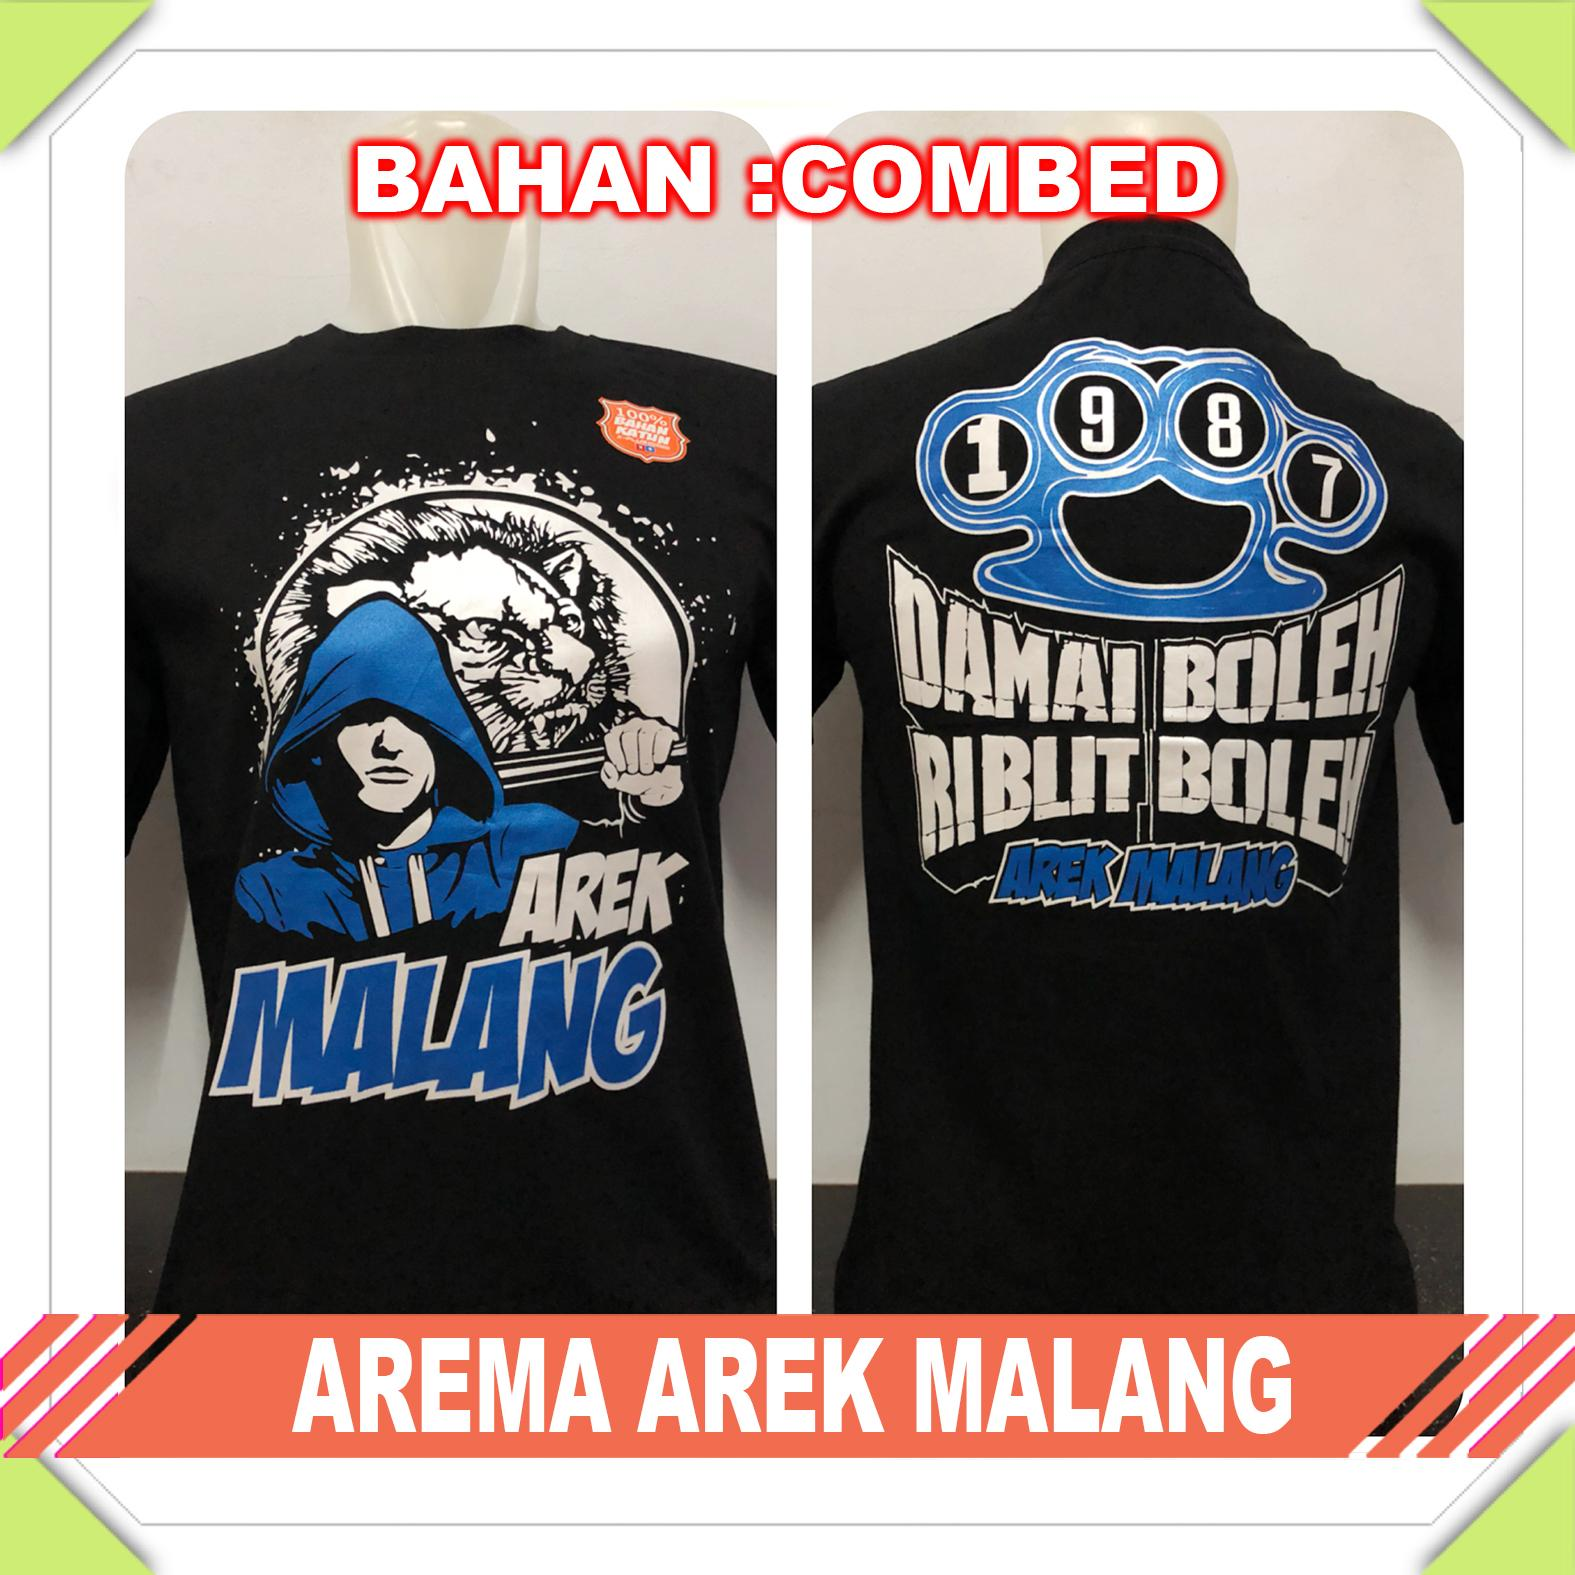 Suppliernatgeo - Kaos T-Shirt Distro / Kaos Pria / Tshirt Pria / Distro Pria / Baju Pria Premium Bola Indonesia Arema Arek Malang - Hitam